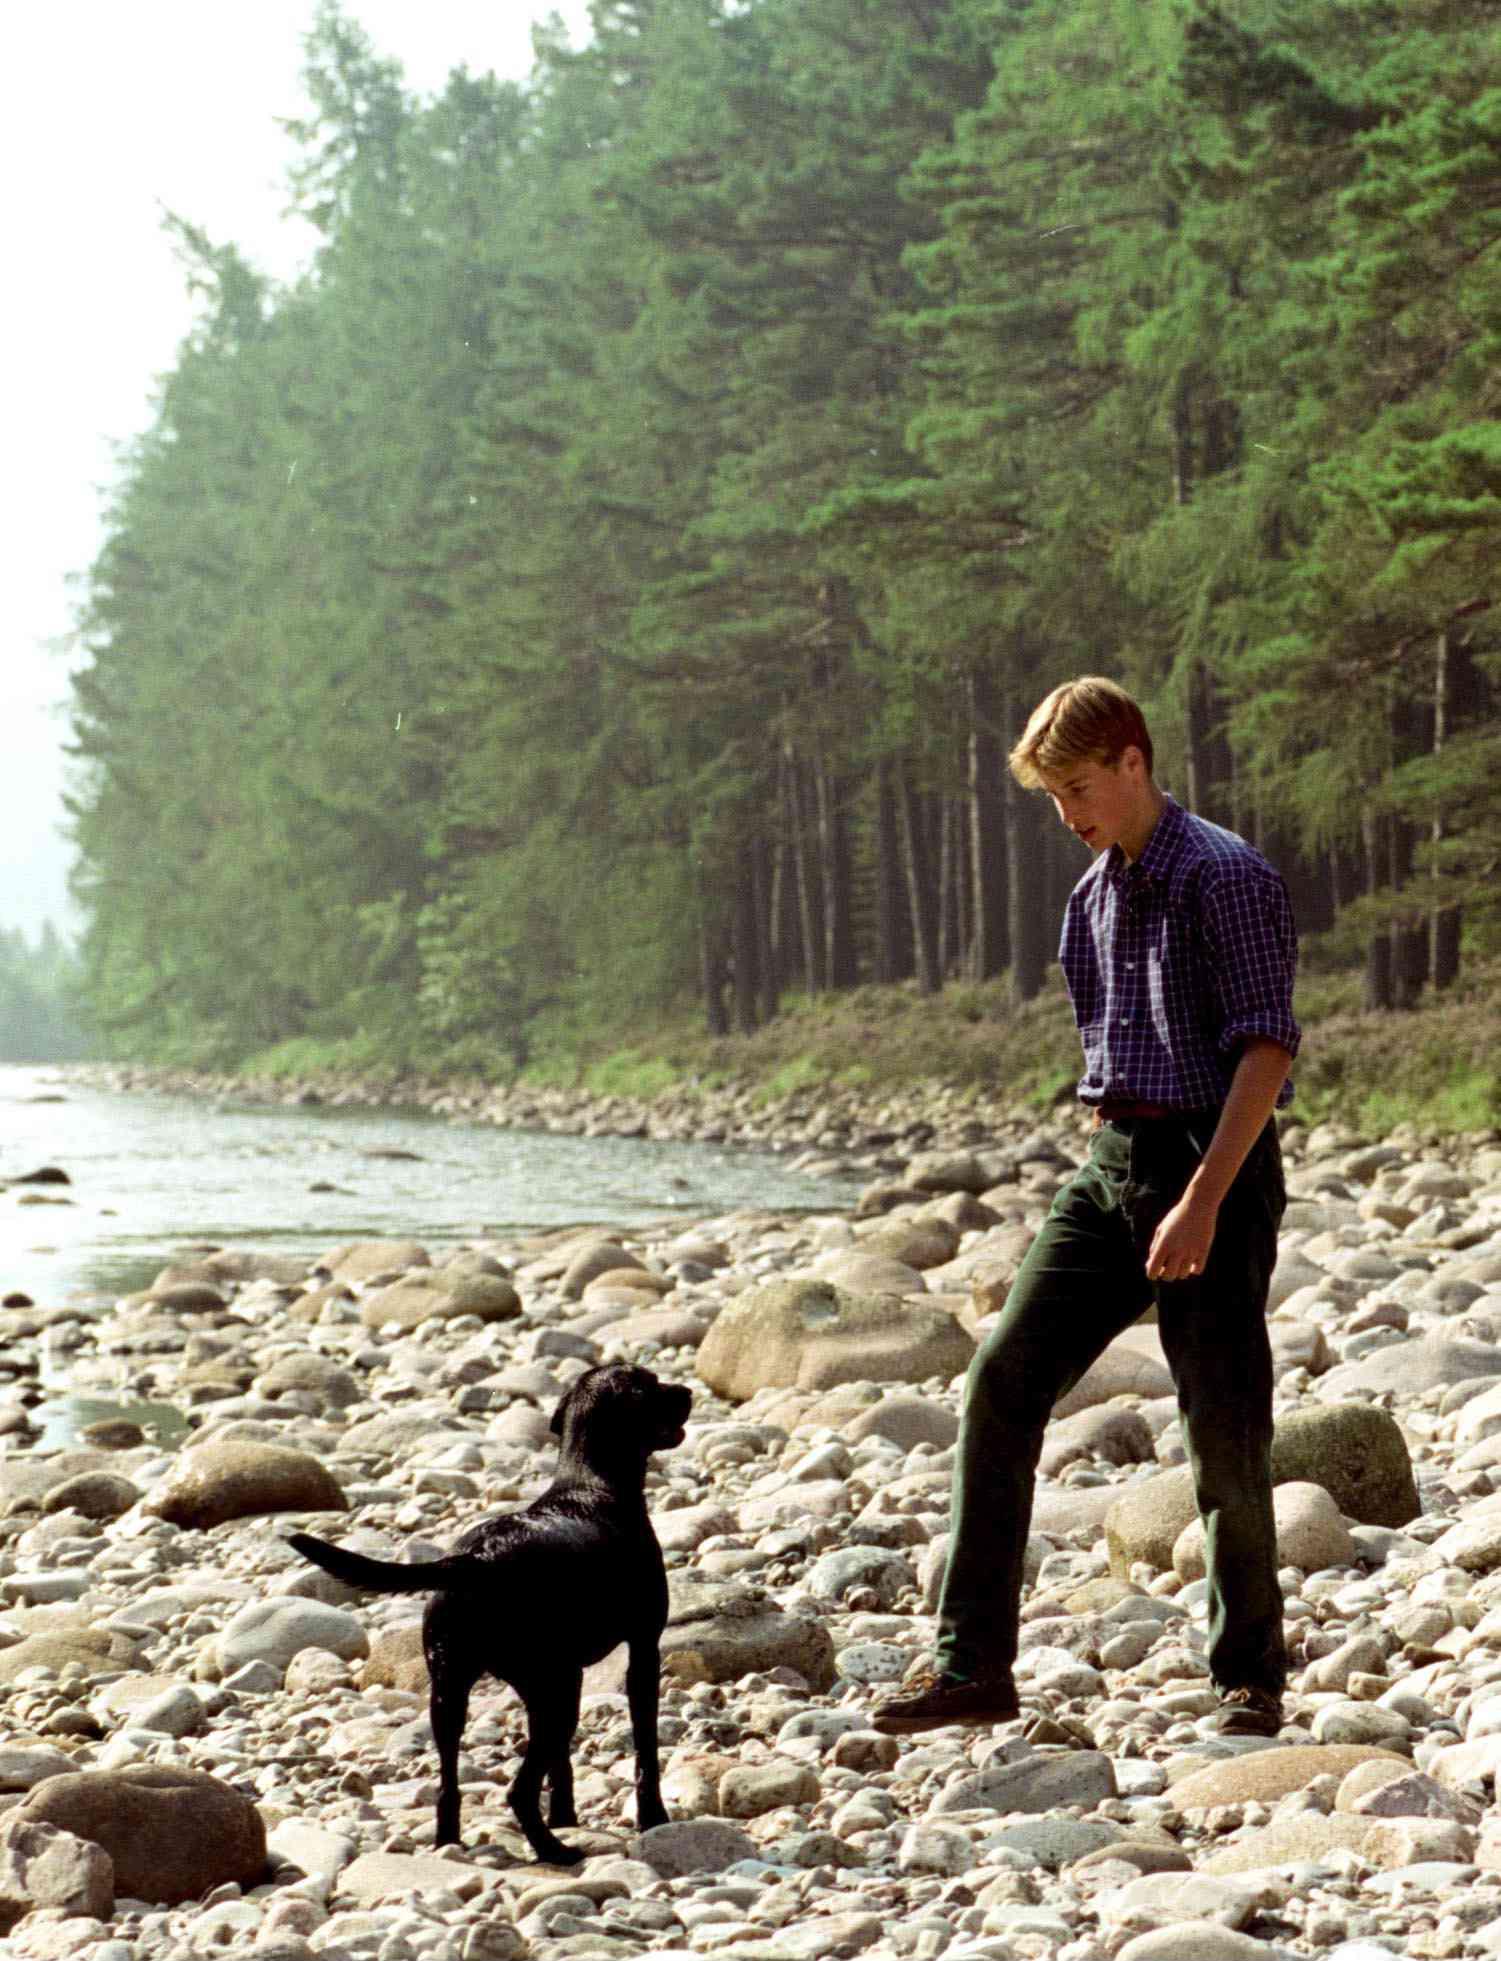 Prince William and his labrador